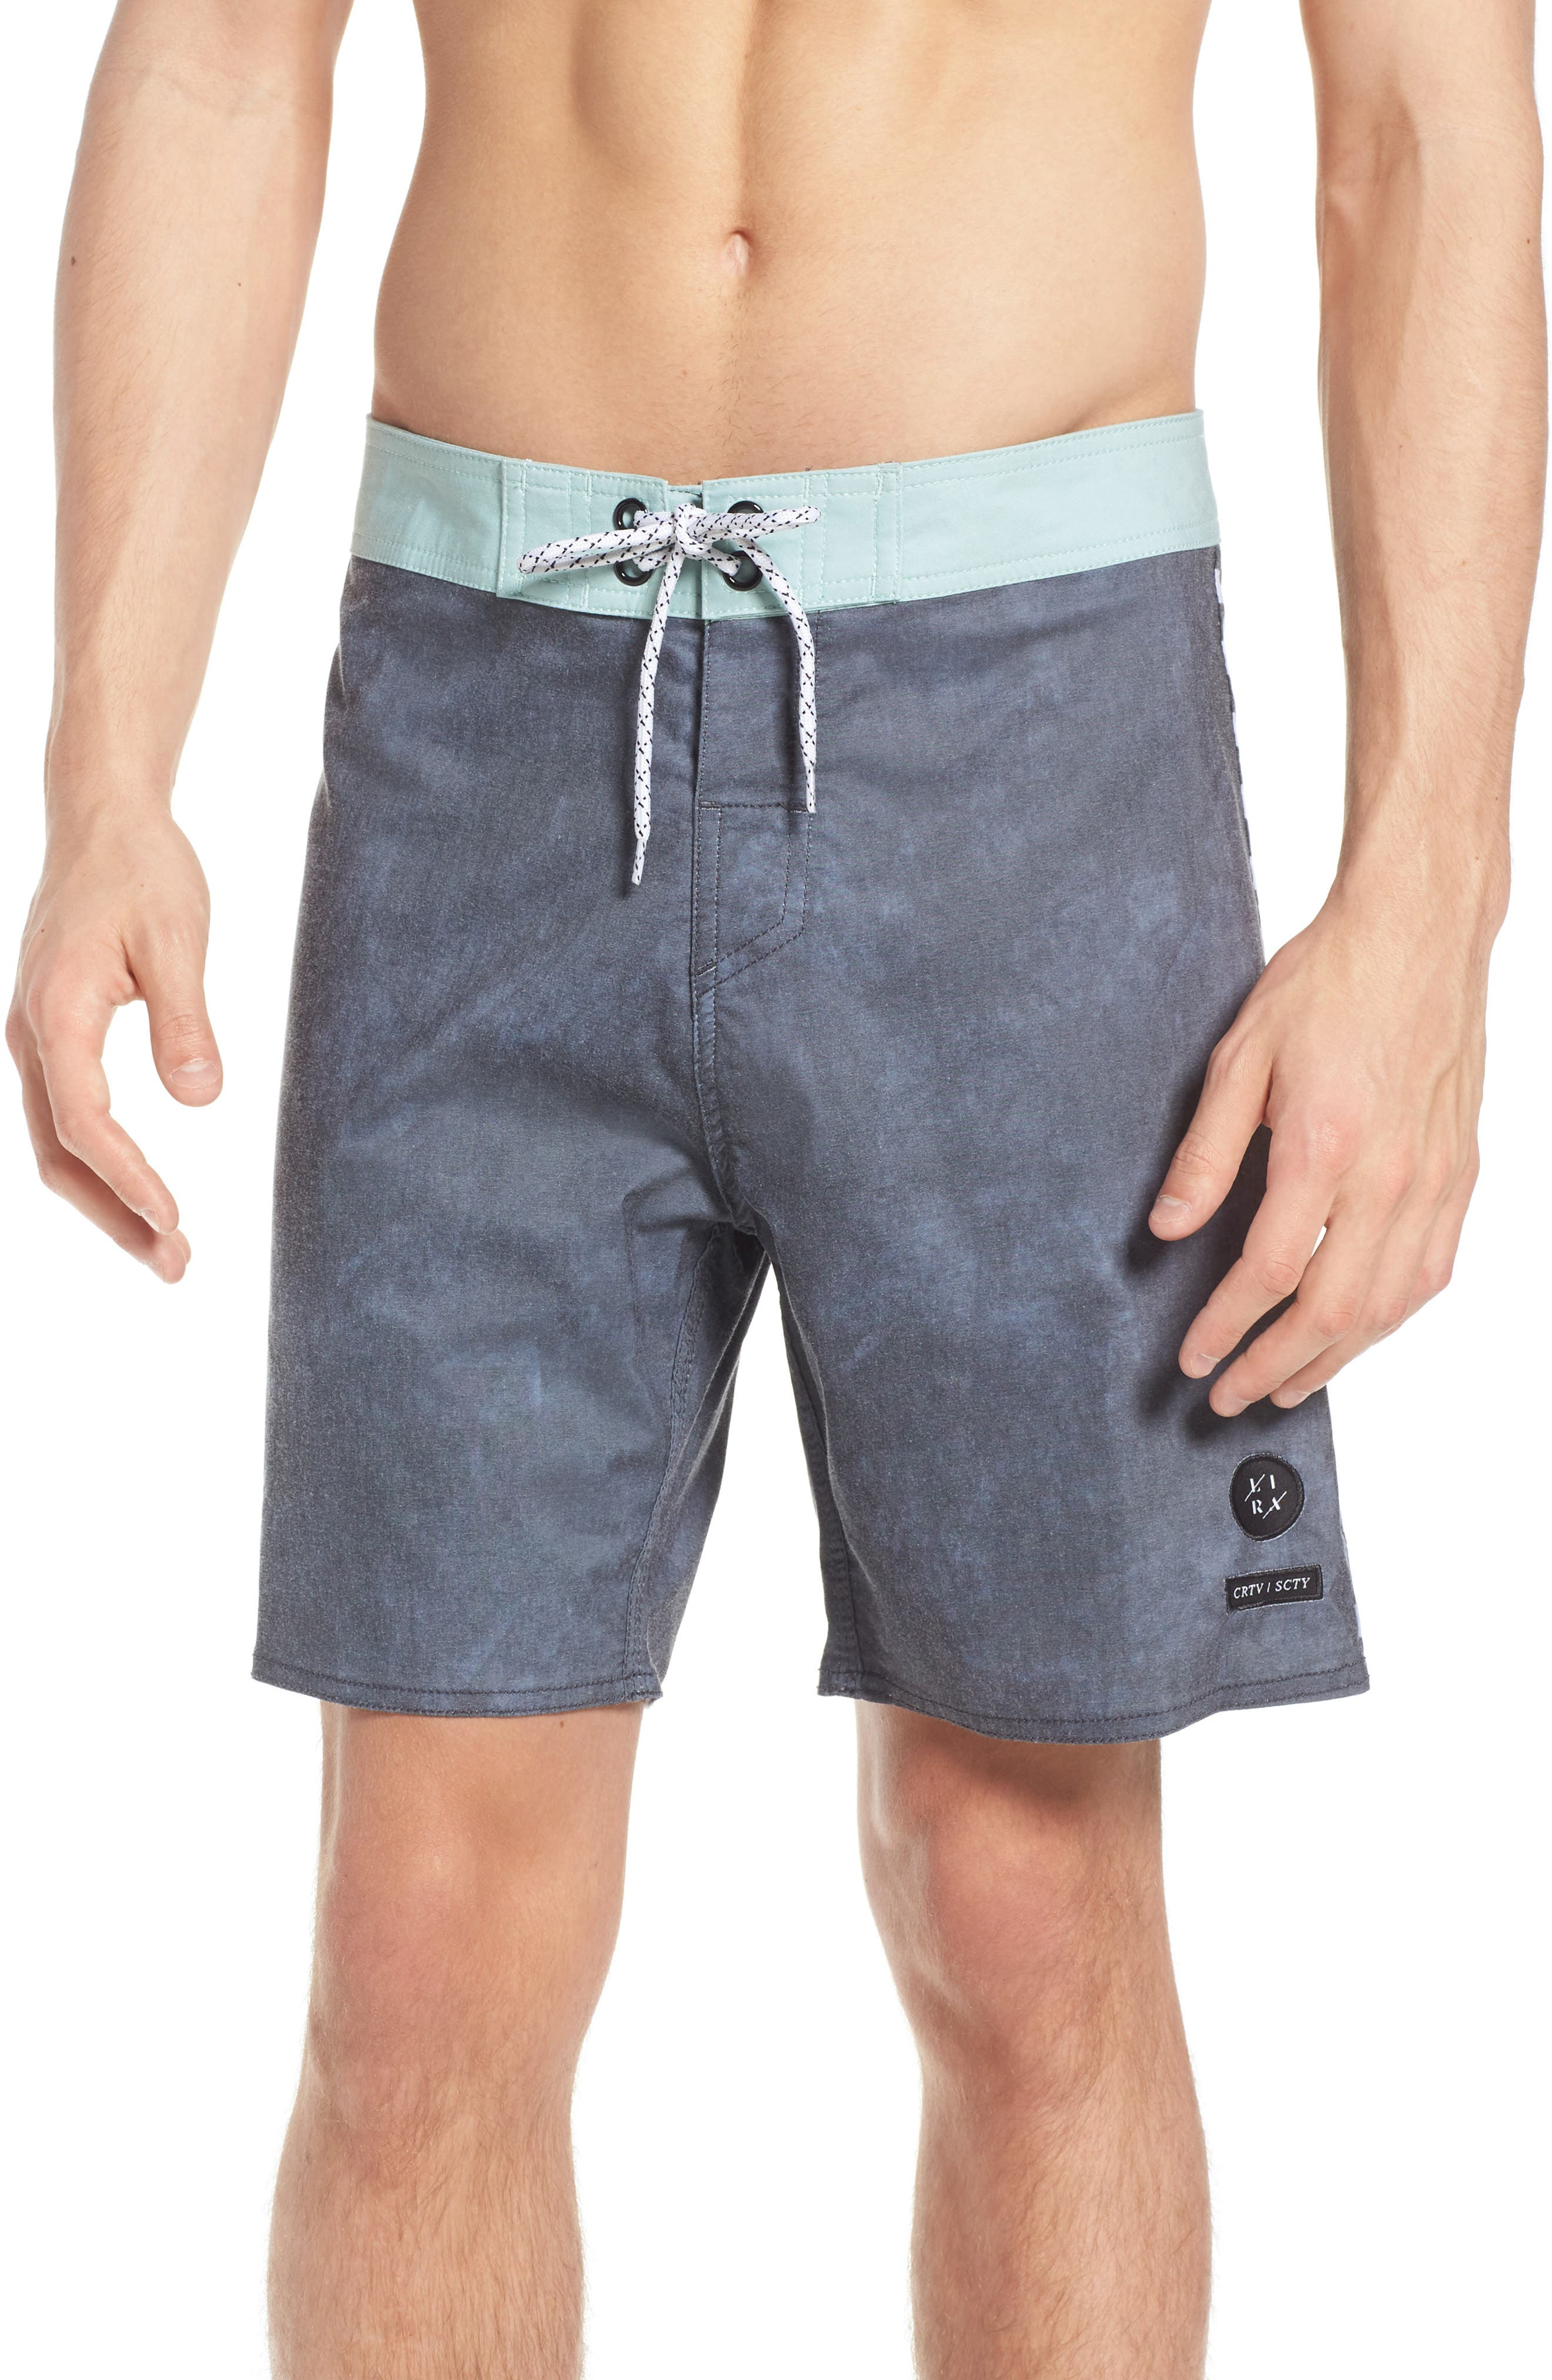 Lira Clothing Side Check Board Shorts